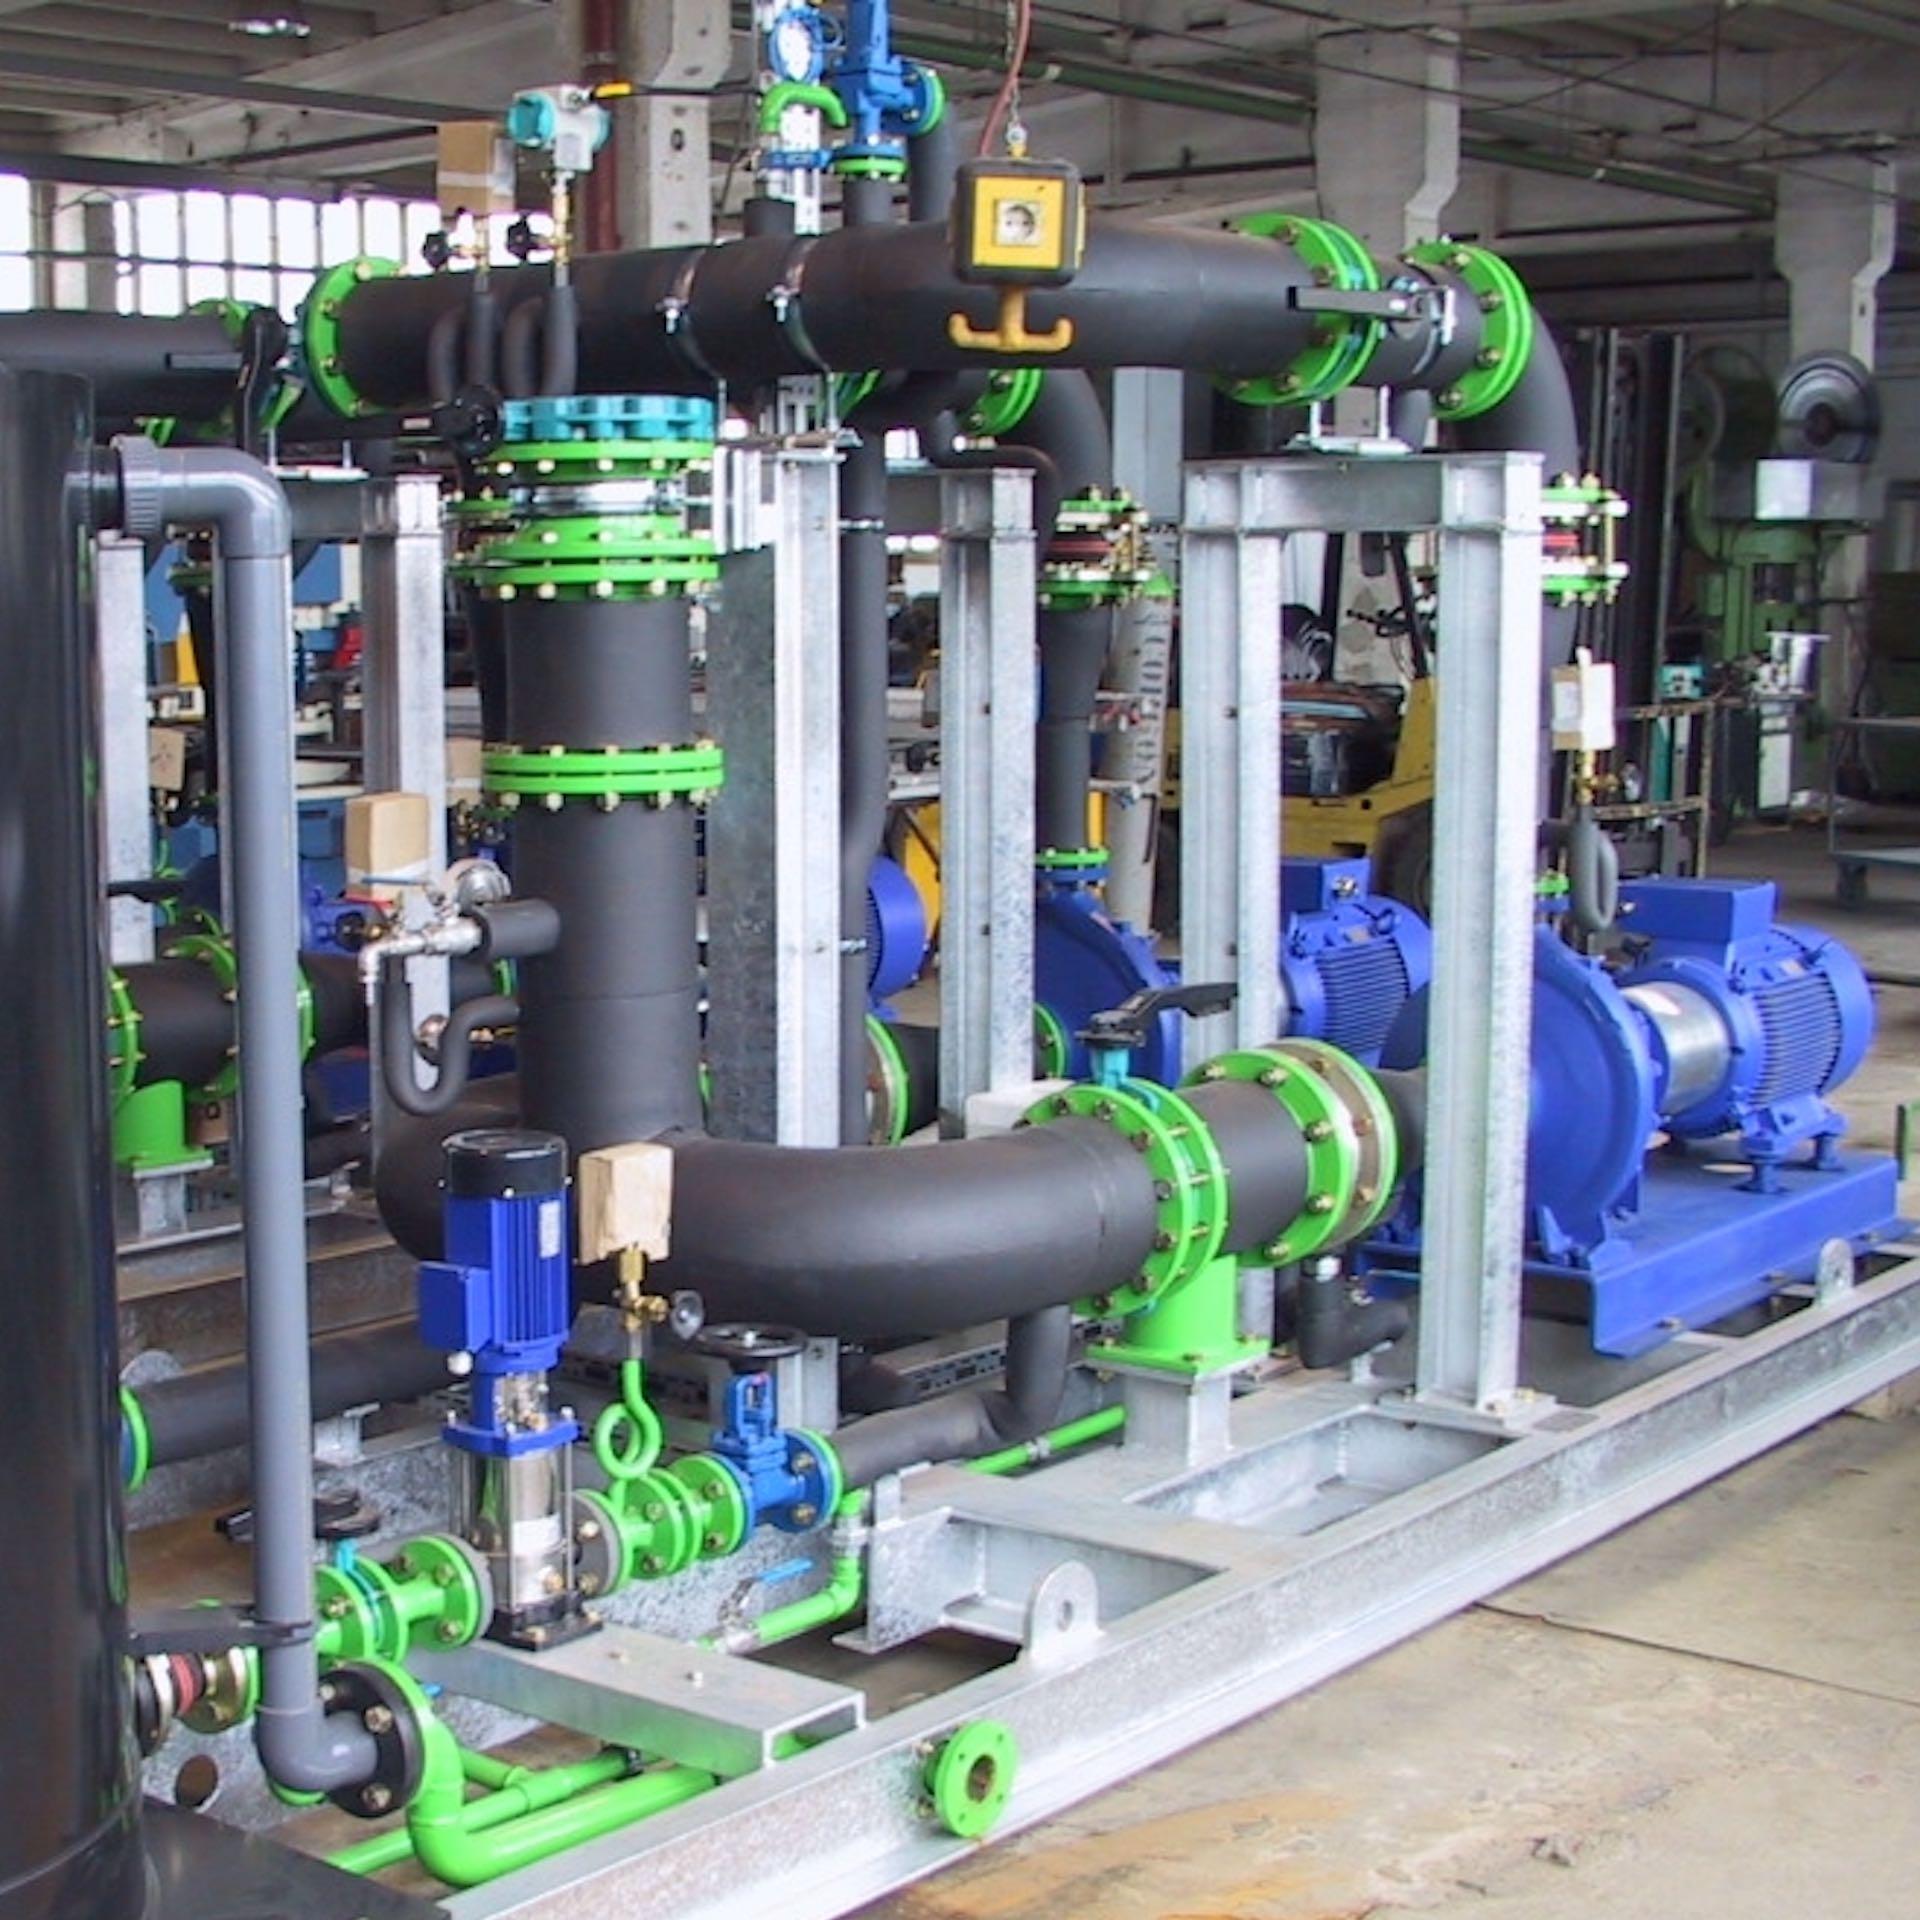 GWA_cooling_systems_technology_part_plant_pump_group_Gesellschaft_fuer_Waerme_und_Anlagentechnik_mbH